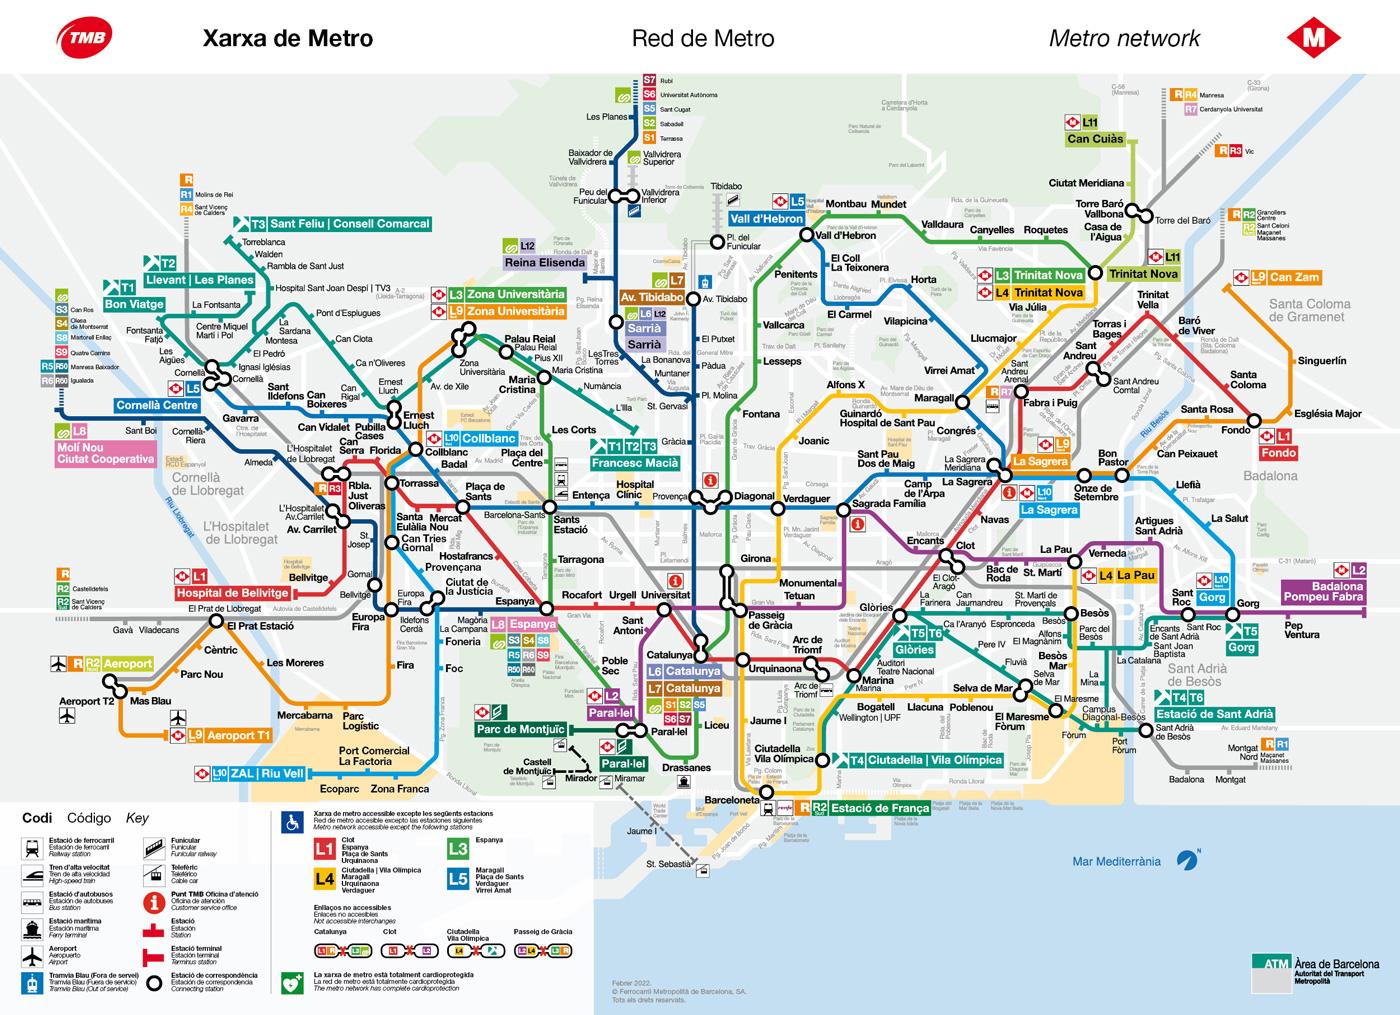 Barcelona metro map 2018 tube map Transports Metropolitans de